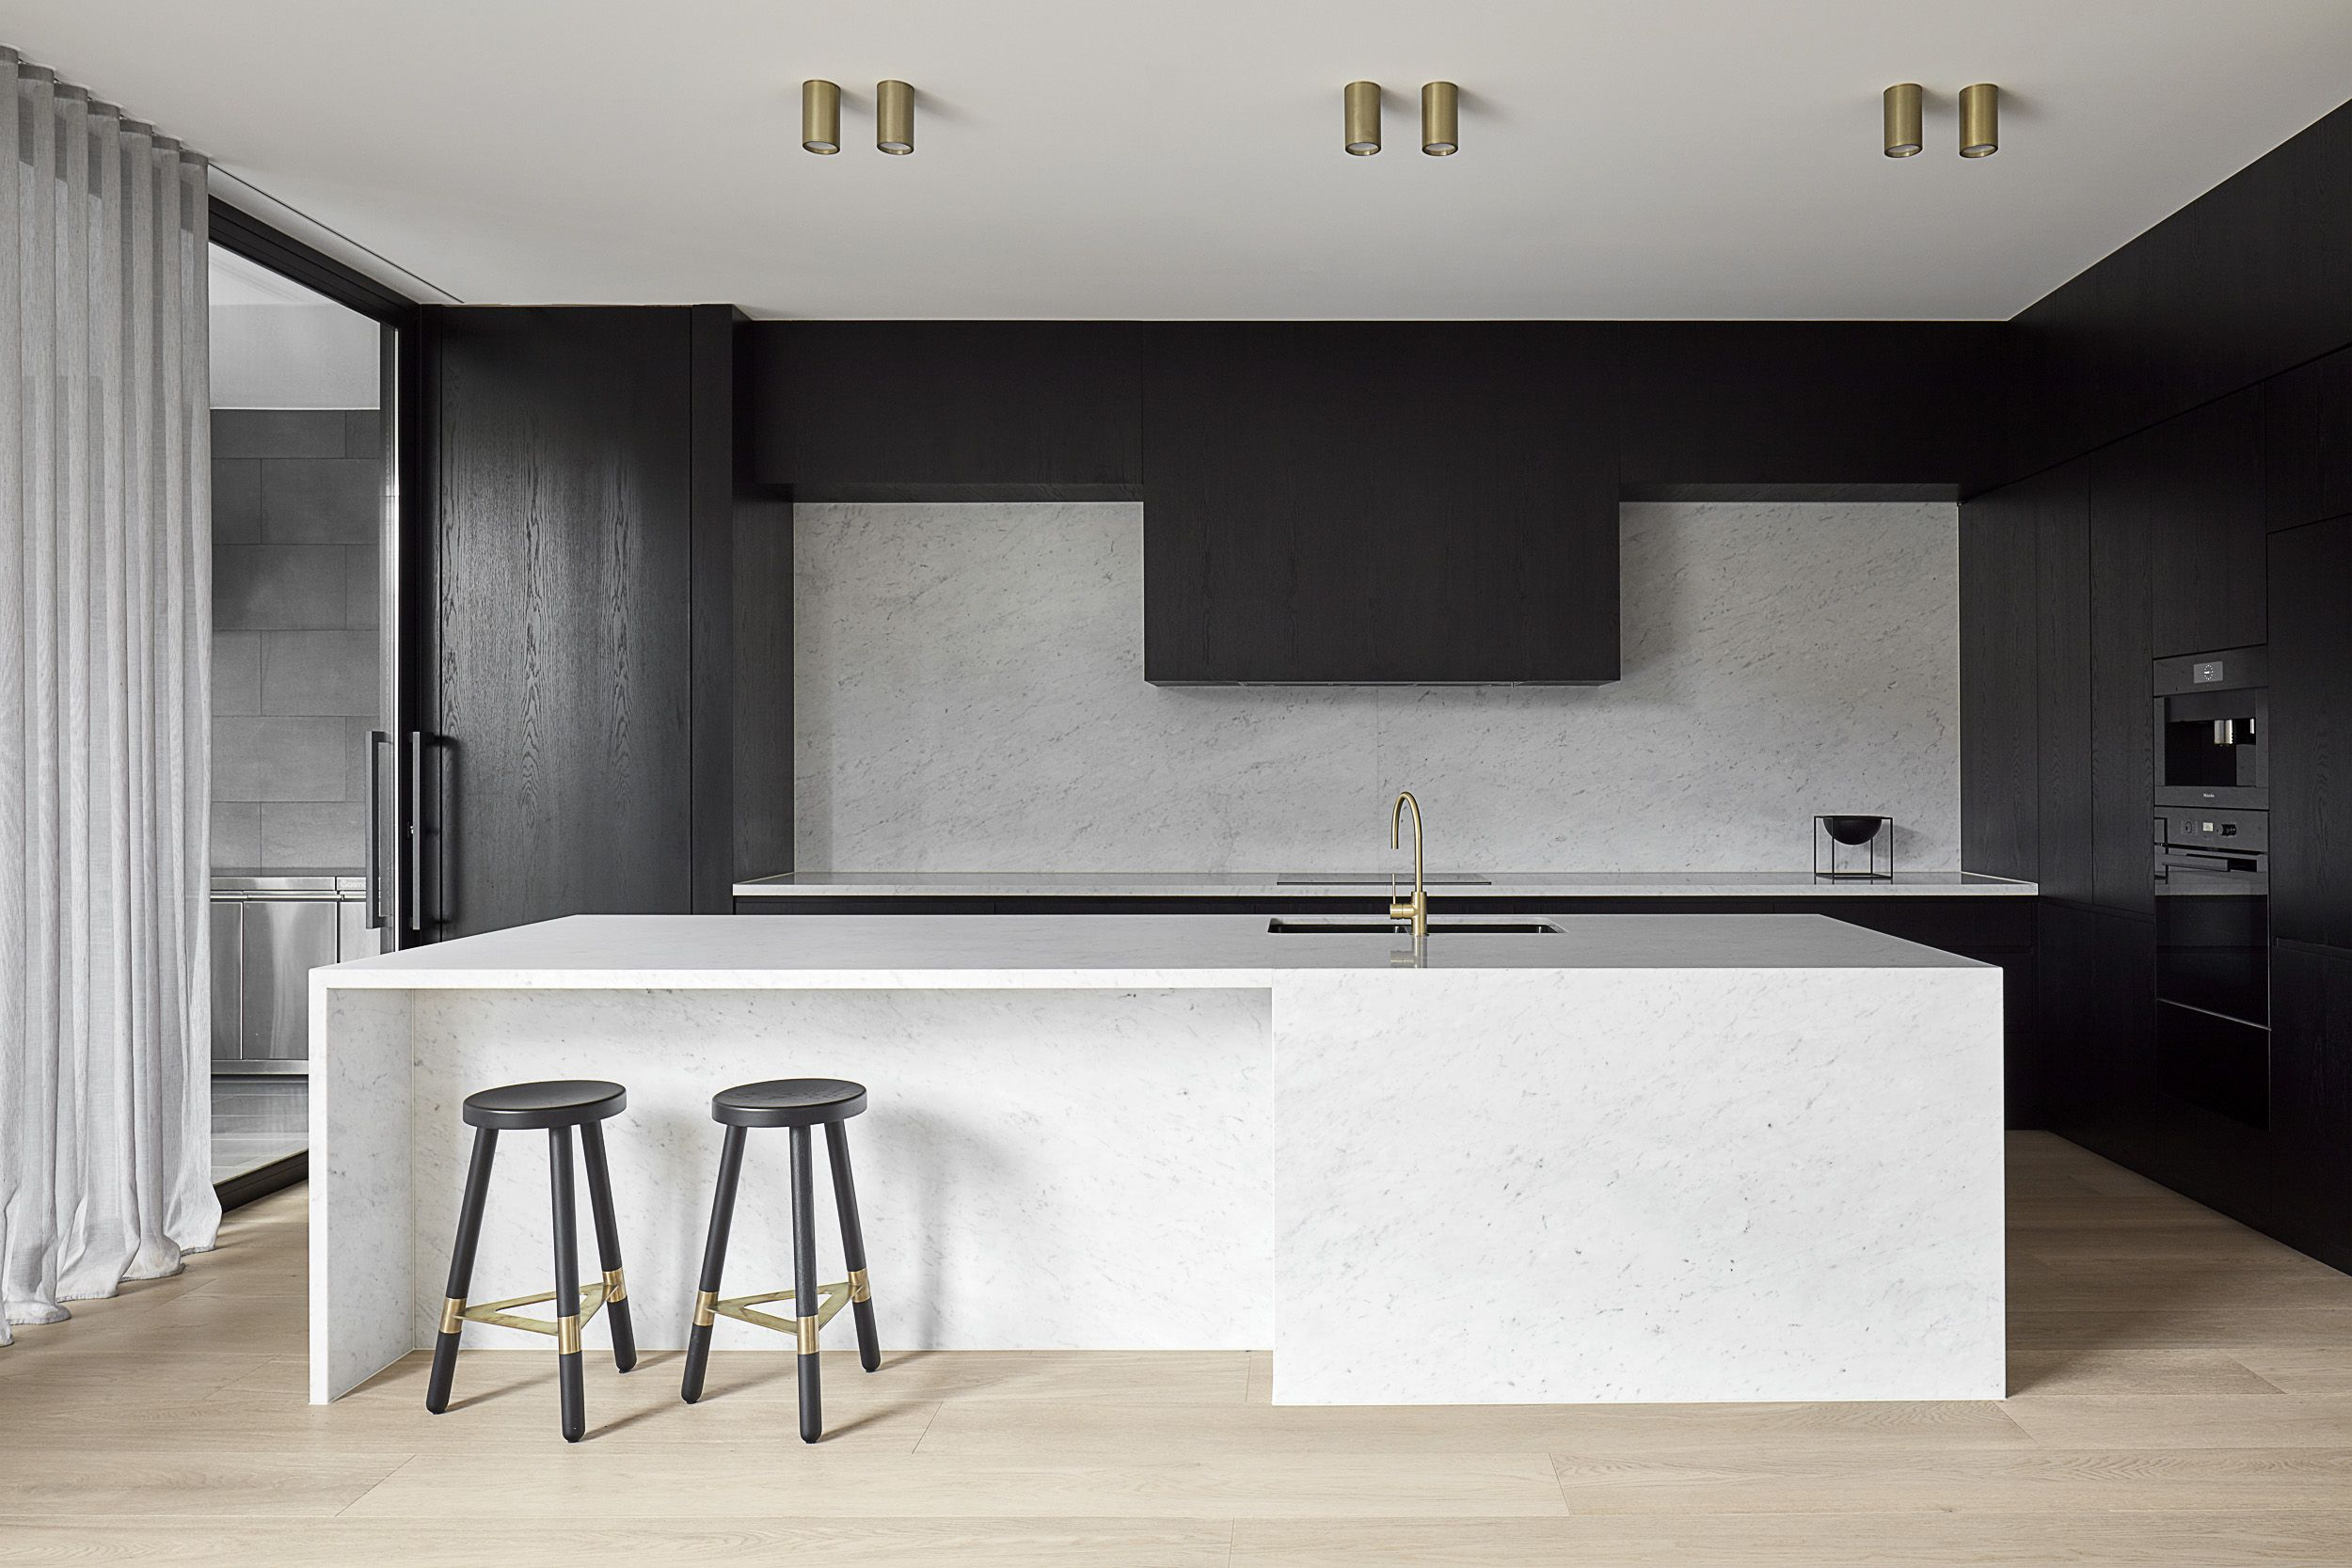 Carrara Marble supplied by Corsi & Nicolai (Australia) Pty